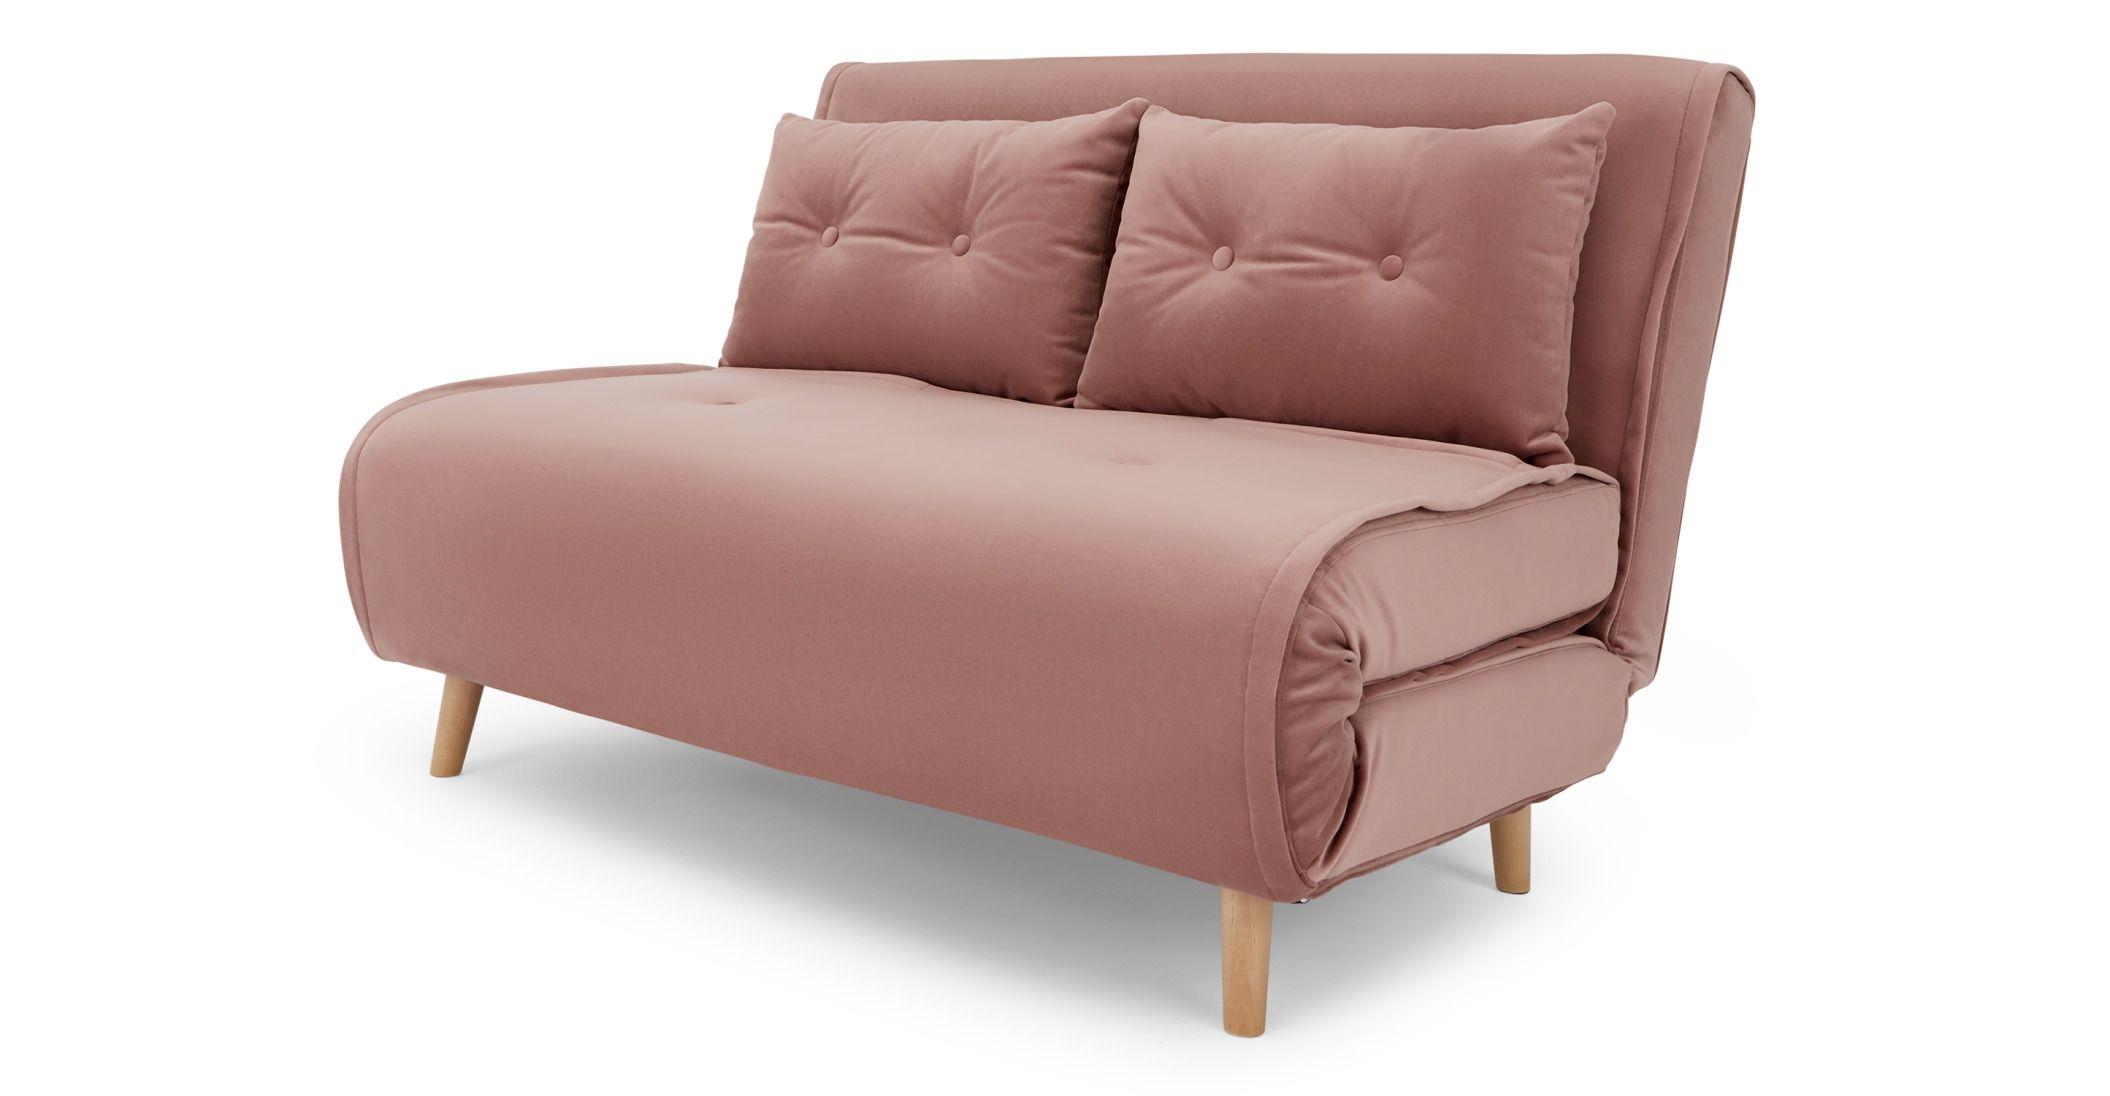 Haru Small Sofa Bed Vintage Pink Velvet Made Com Small Sofa Bed Small Sofa Sofa Bed Vintage